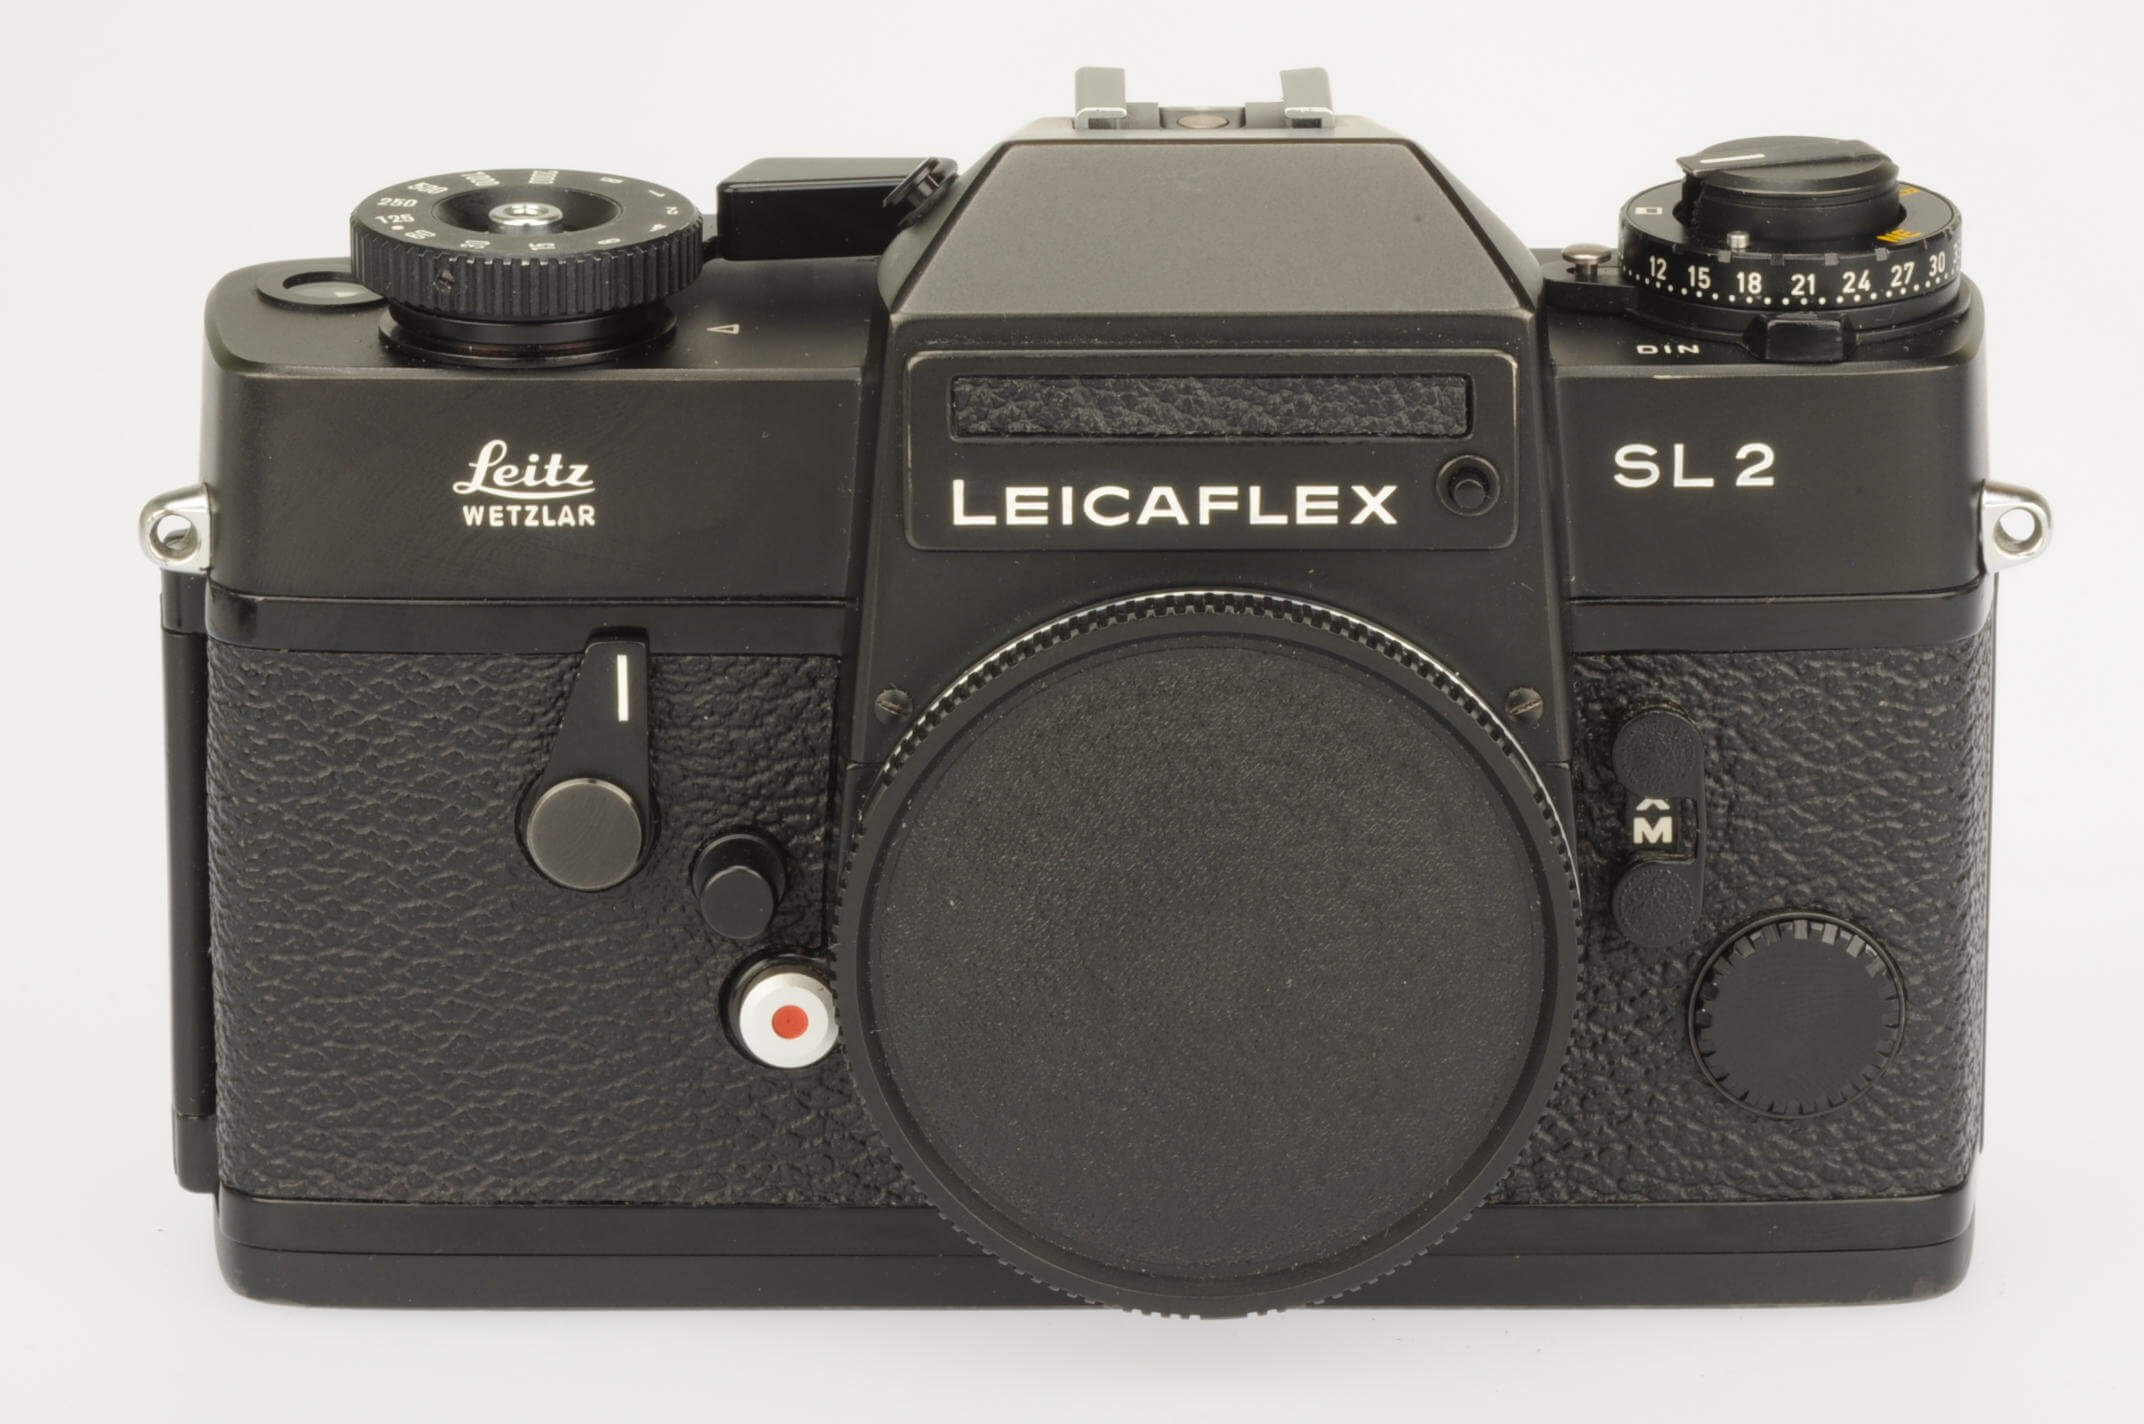 Leicaflex SL2 body, lovely condition!